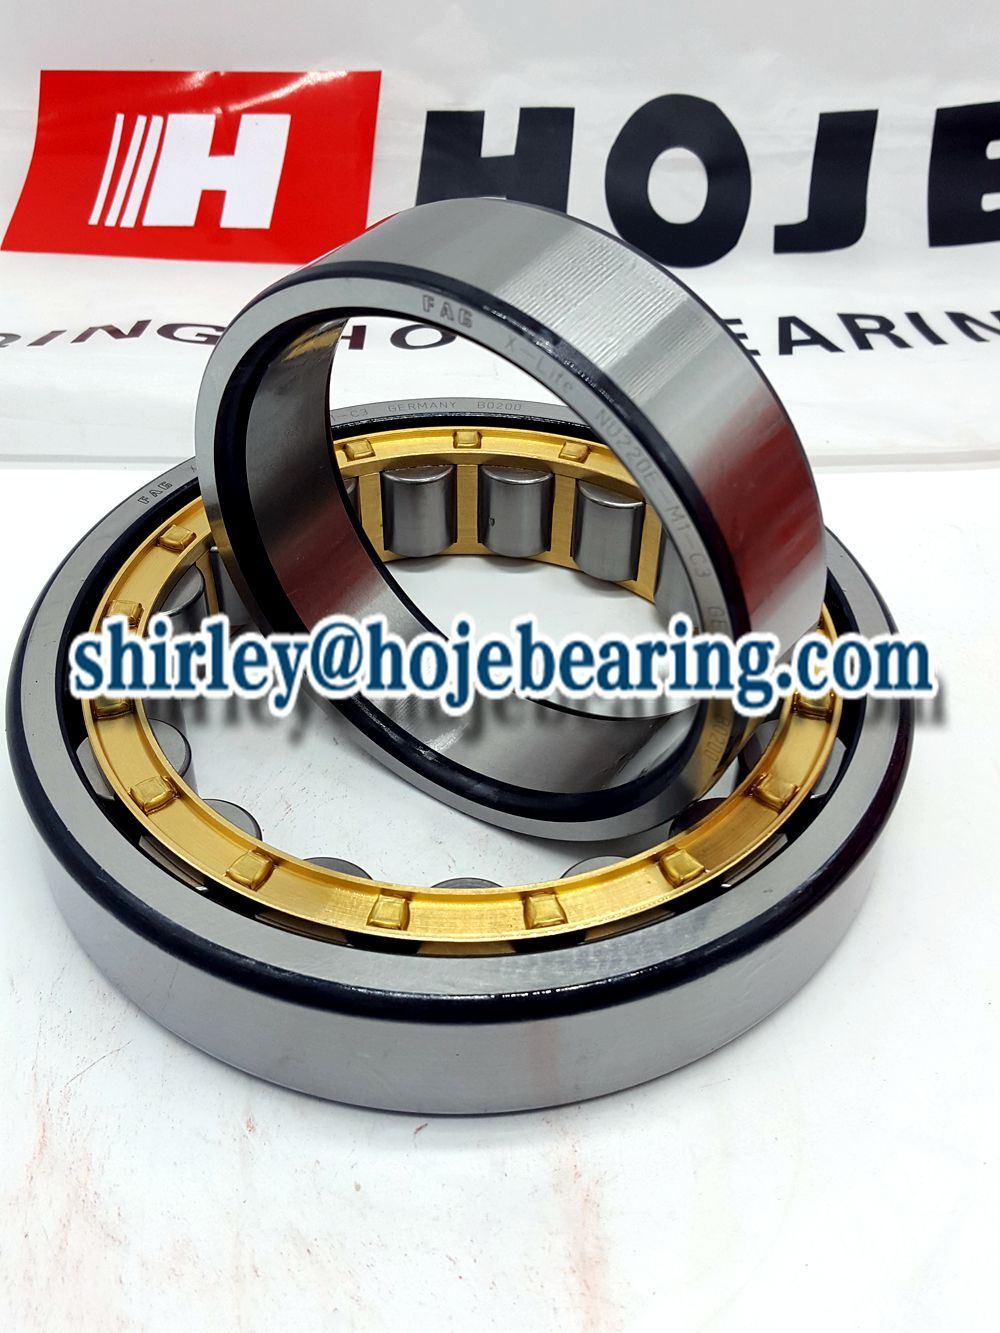 Single Row Spindle Bearing Cylindrical Roller Bearing Nu202ecp, Nj202ecp